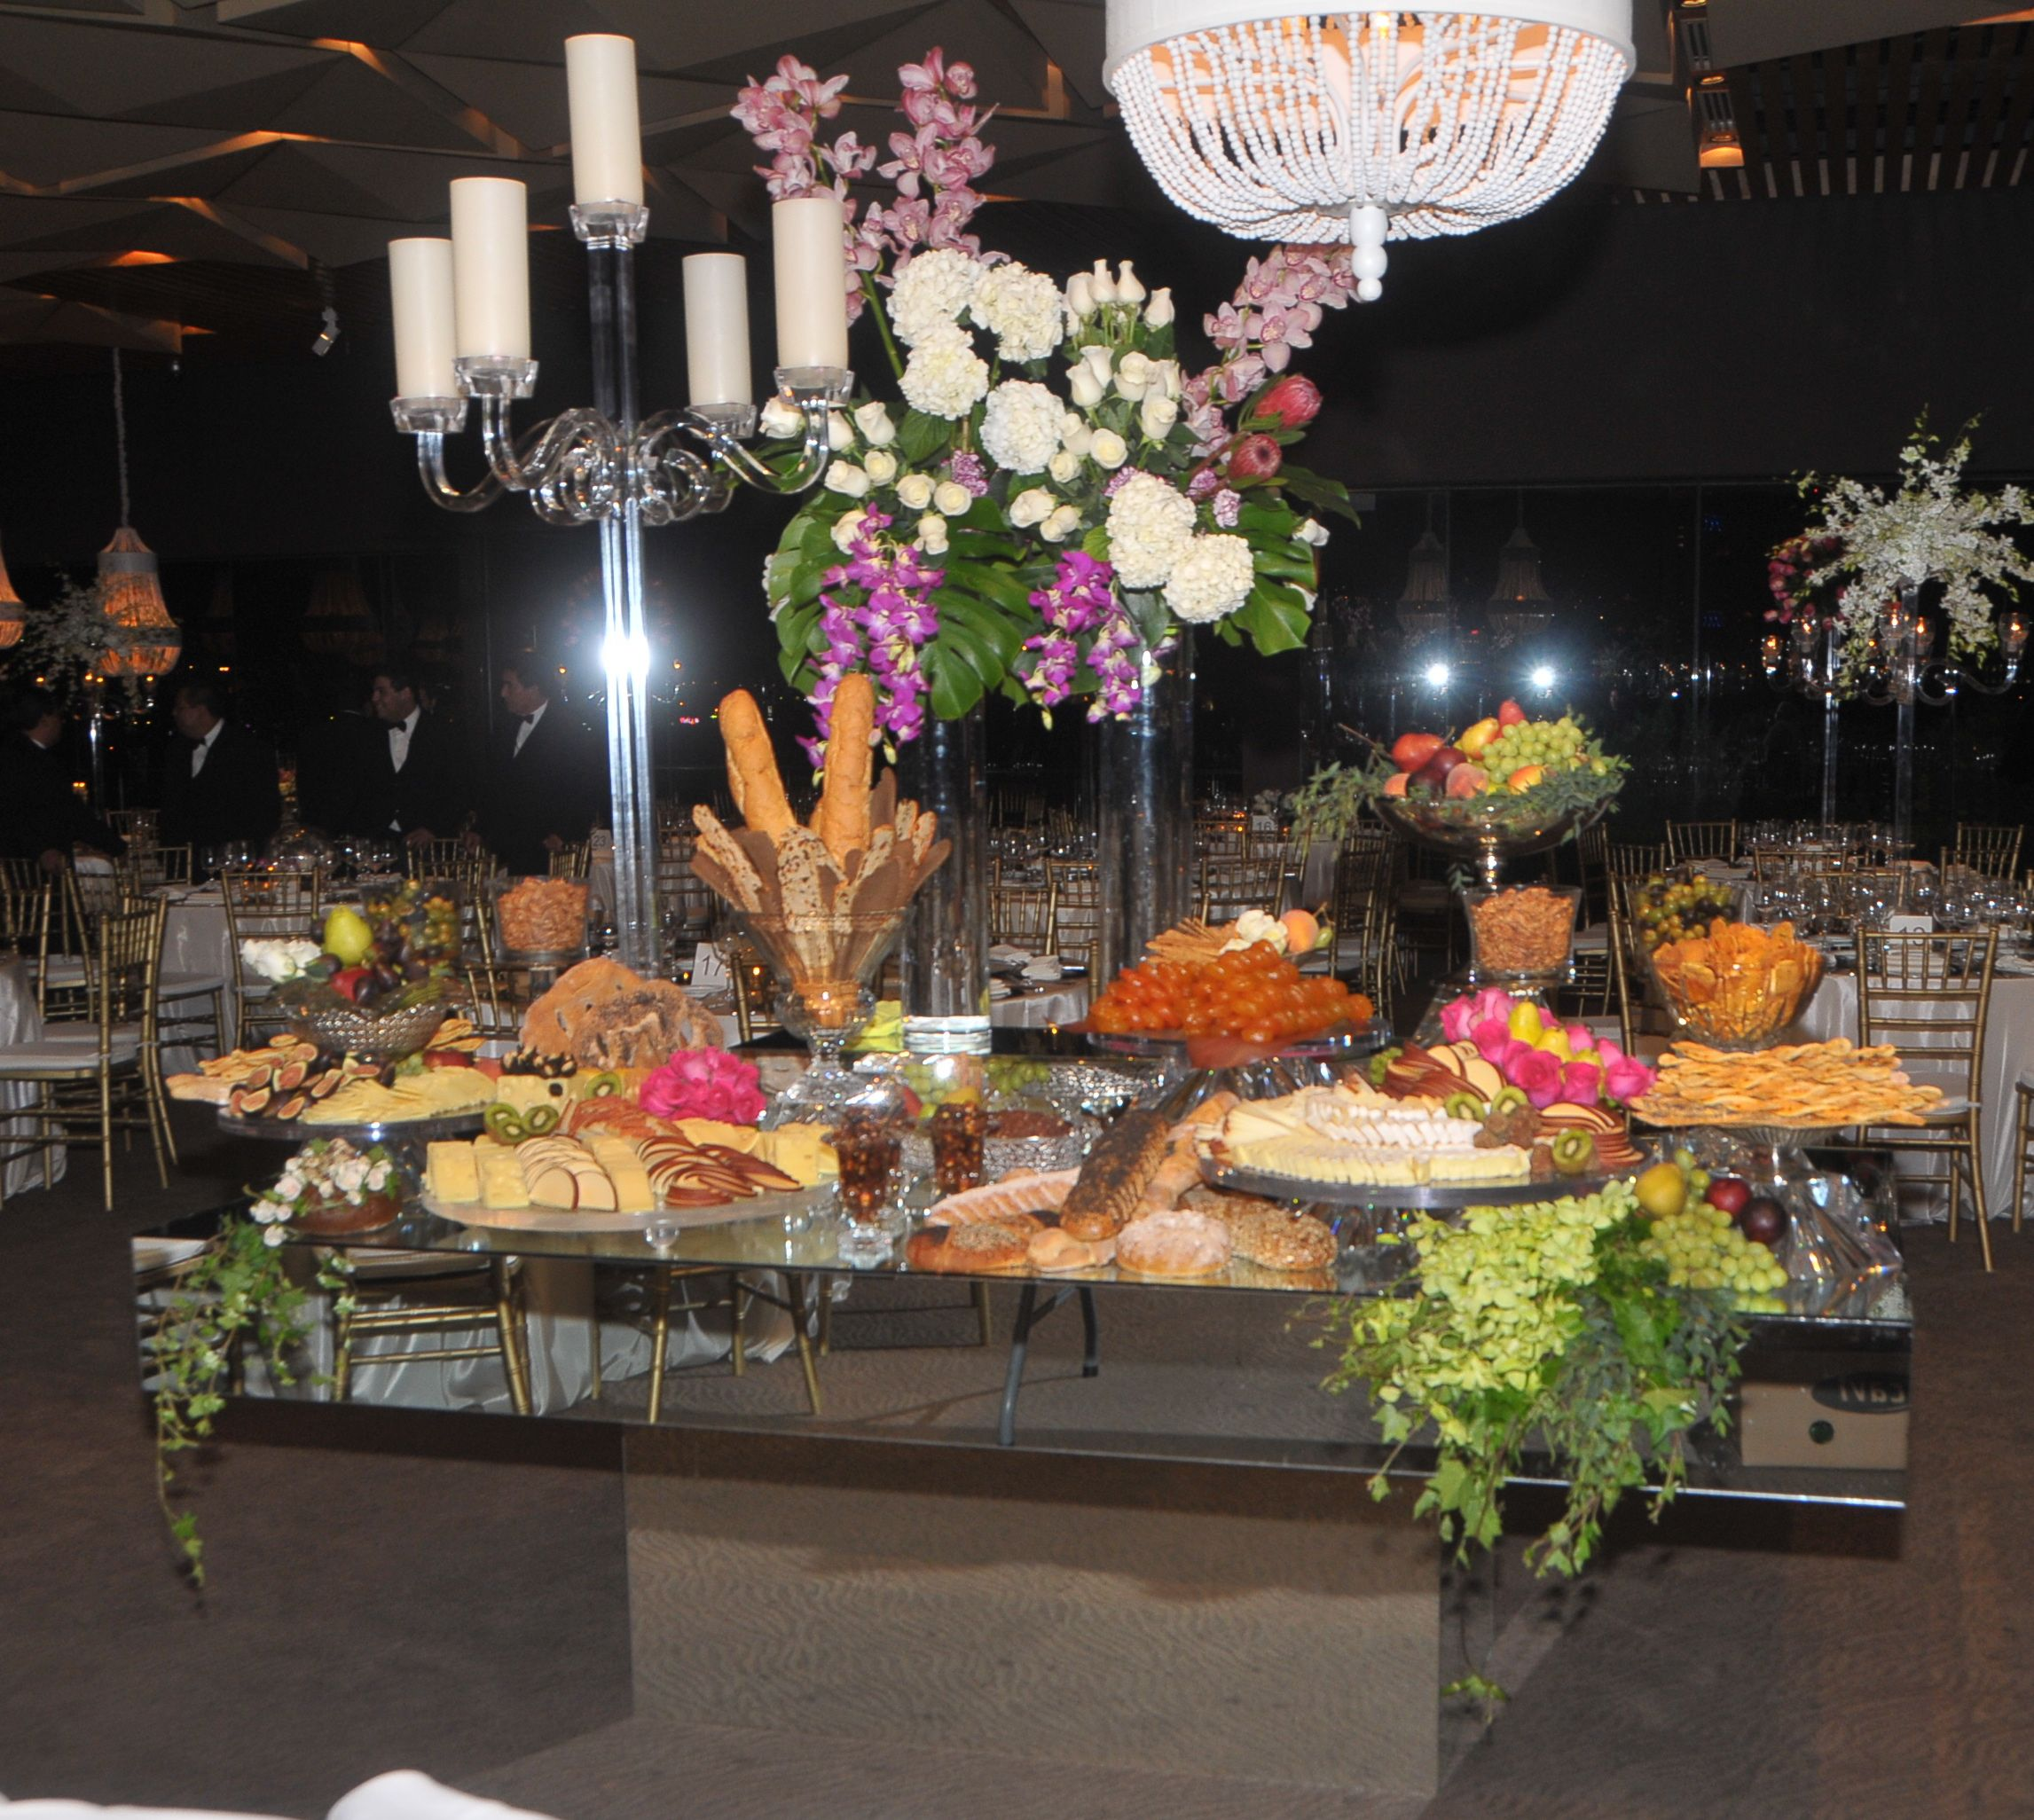 Mesa espejo como mesa de quesos en boda mesas de quesos - Mesa de quesos para bodas ...